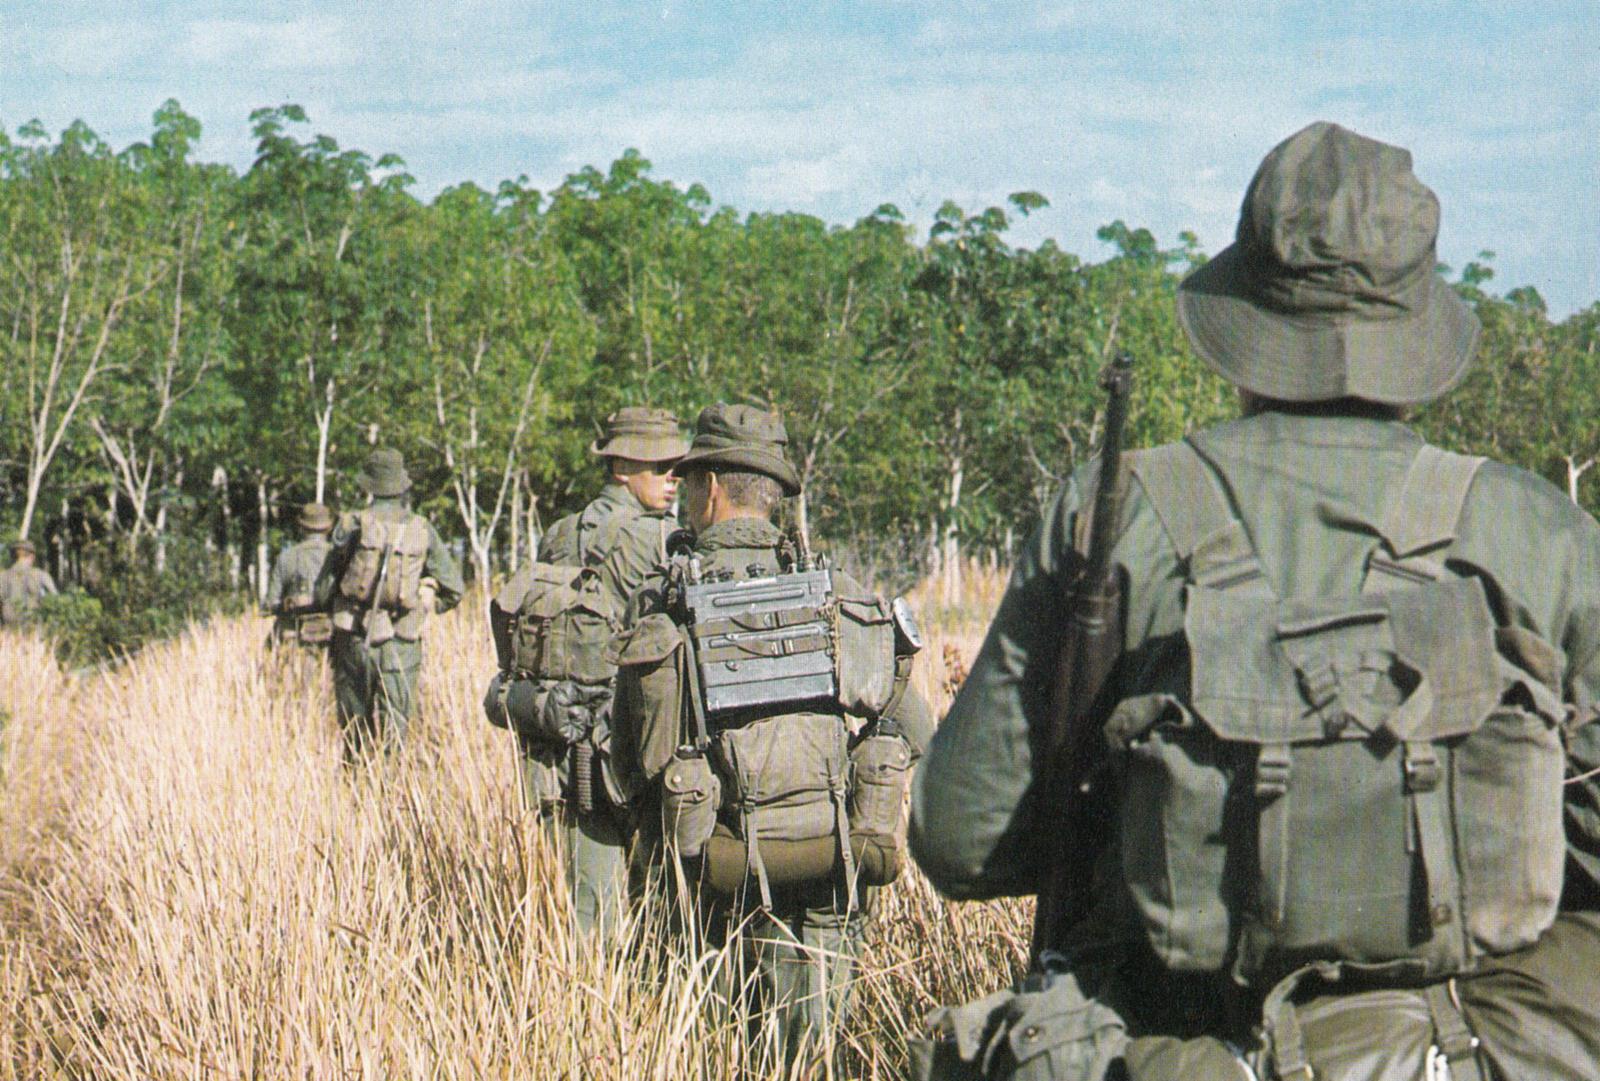 australian_infantry_on_patrol.jpg